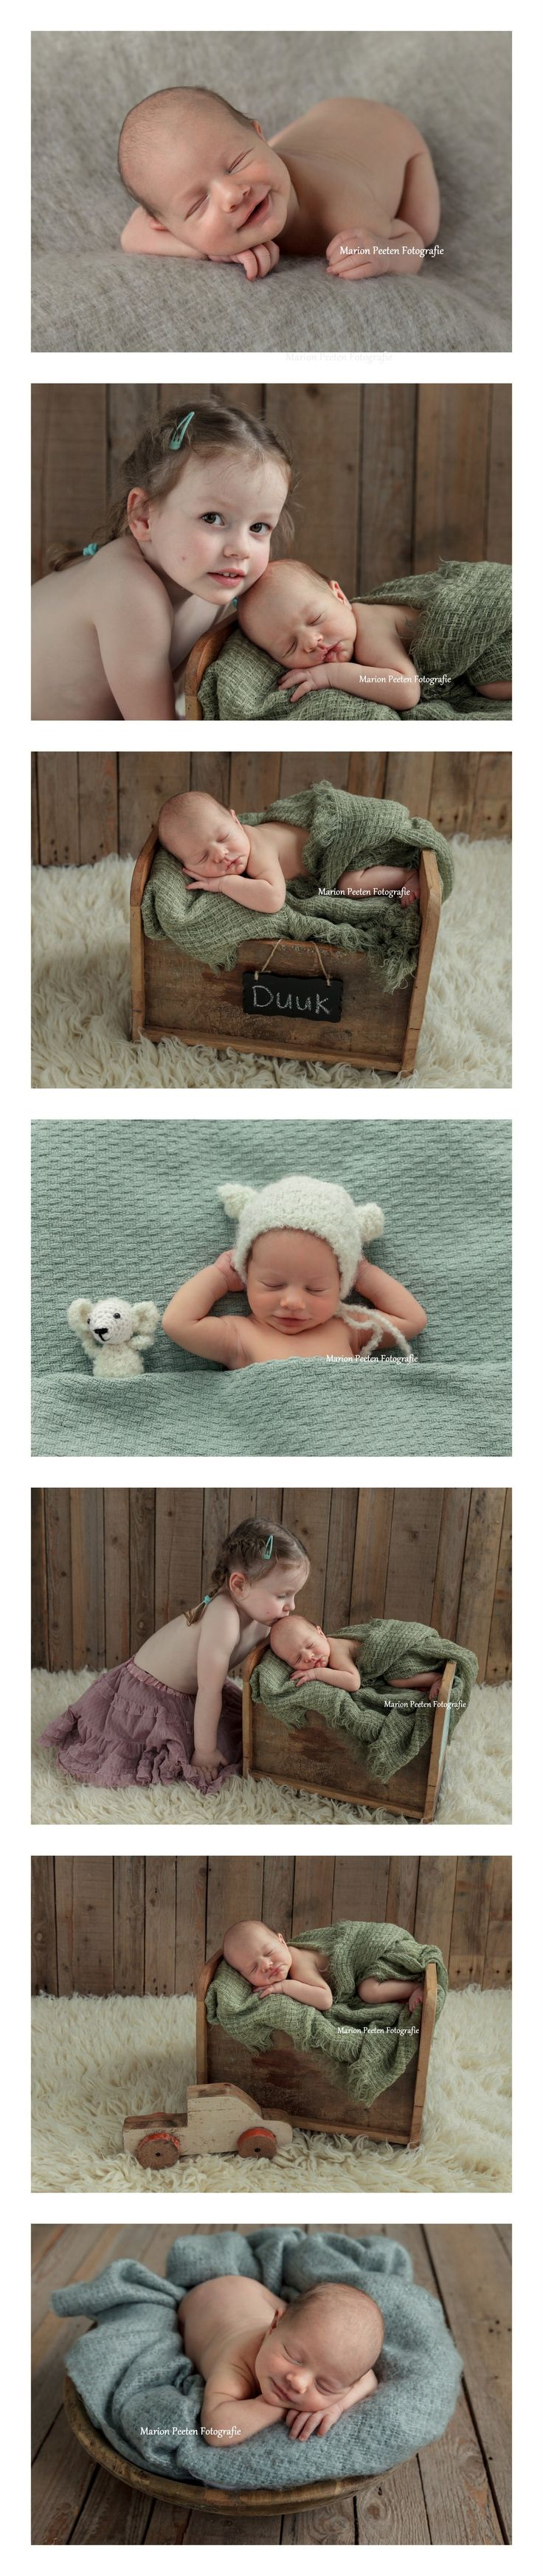 newborn photography#marion peeten fotografie#studio photography#newborn in little bed#newborn with sister#fotograaf limburg#newborn fotograaf maasbree